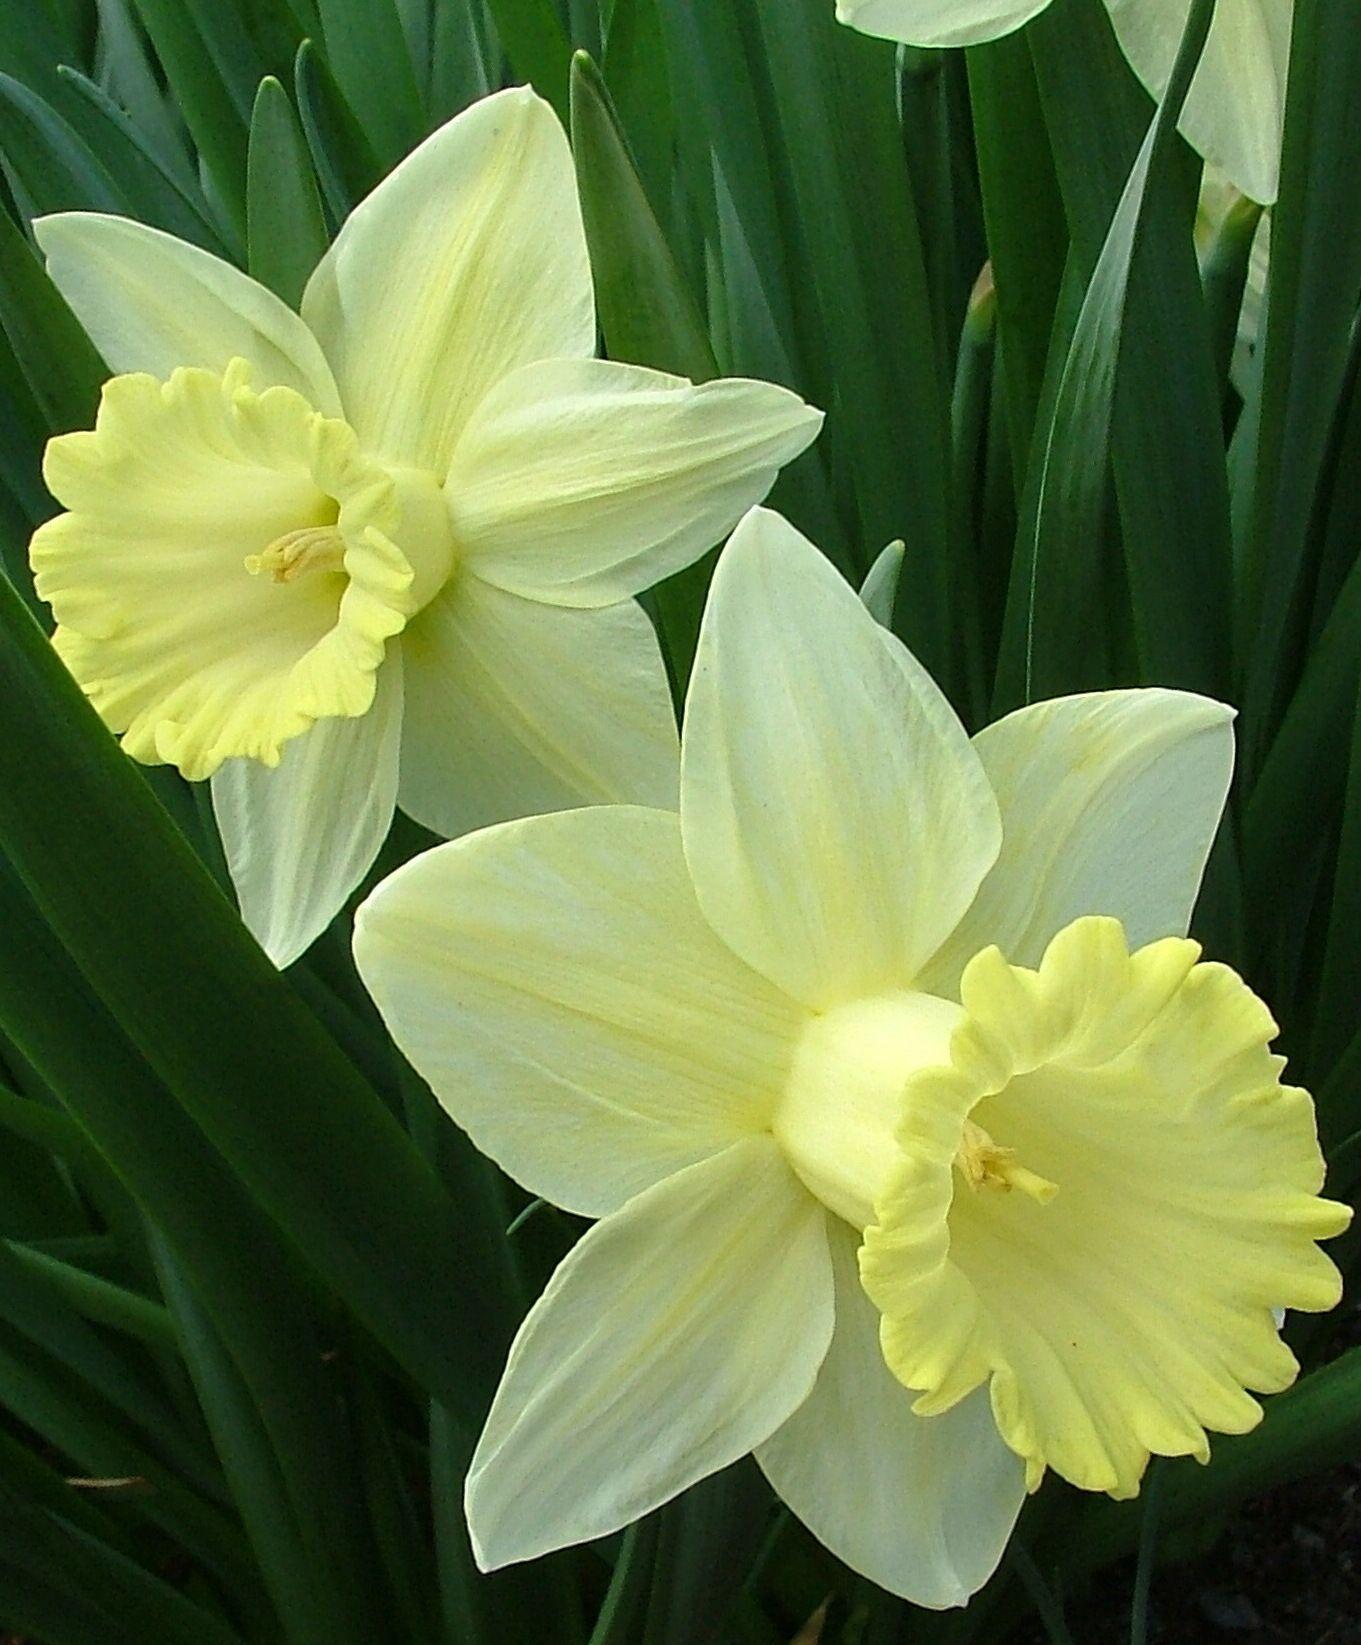 Narcissus December Birth Flower In Turqoise December Birthstone 2